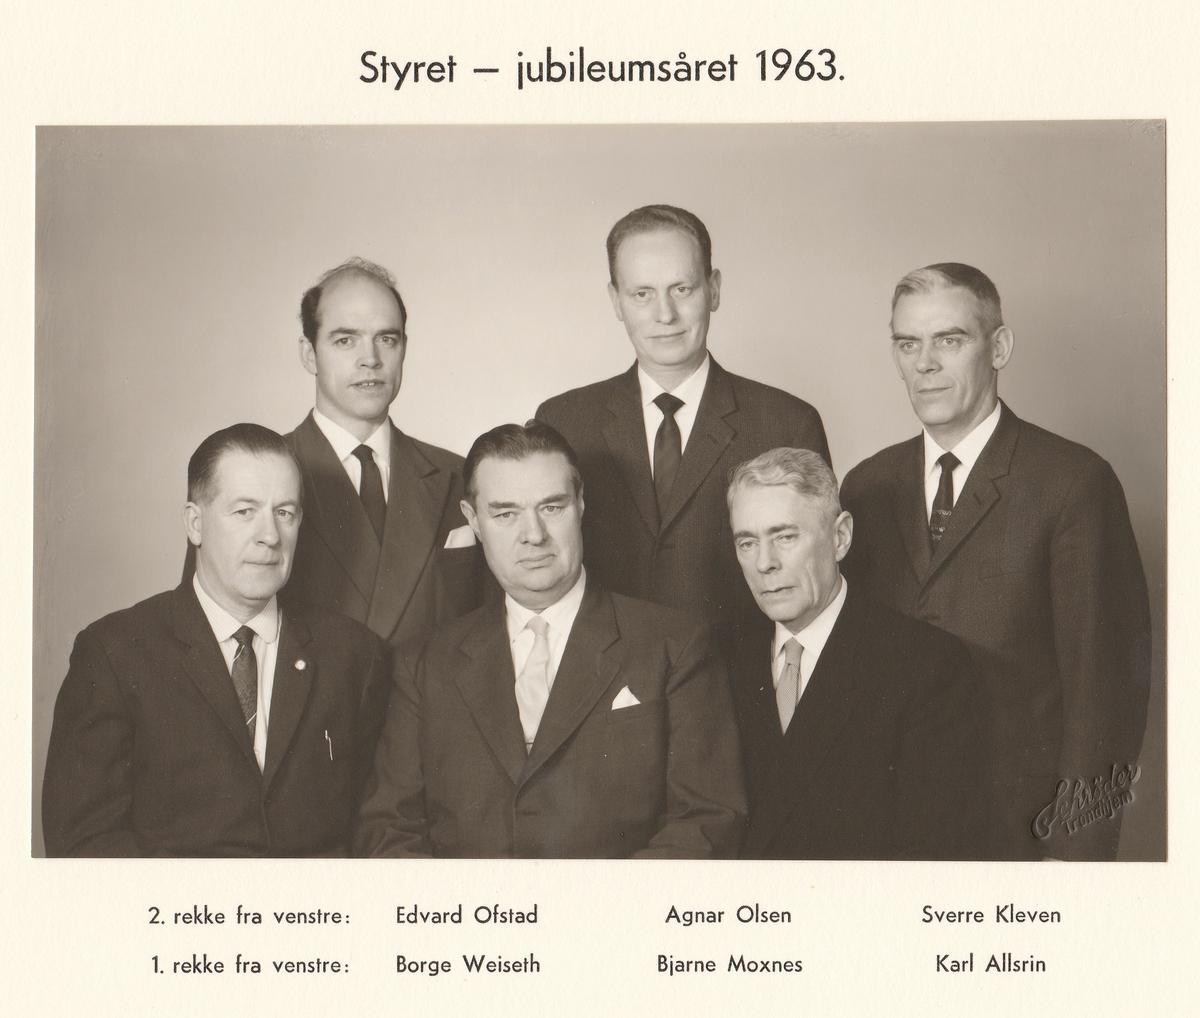 Styret - jubileumsåret 1963